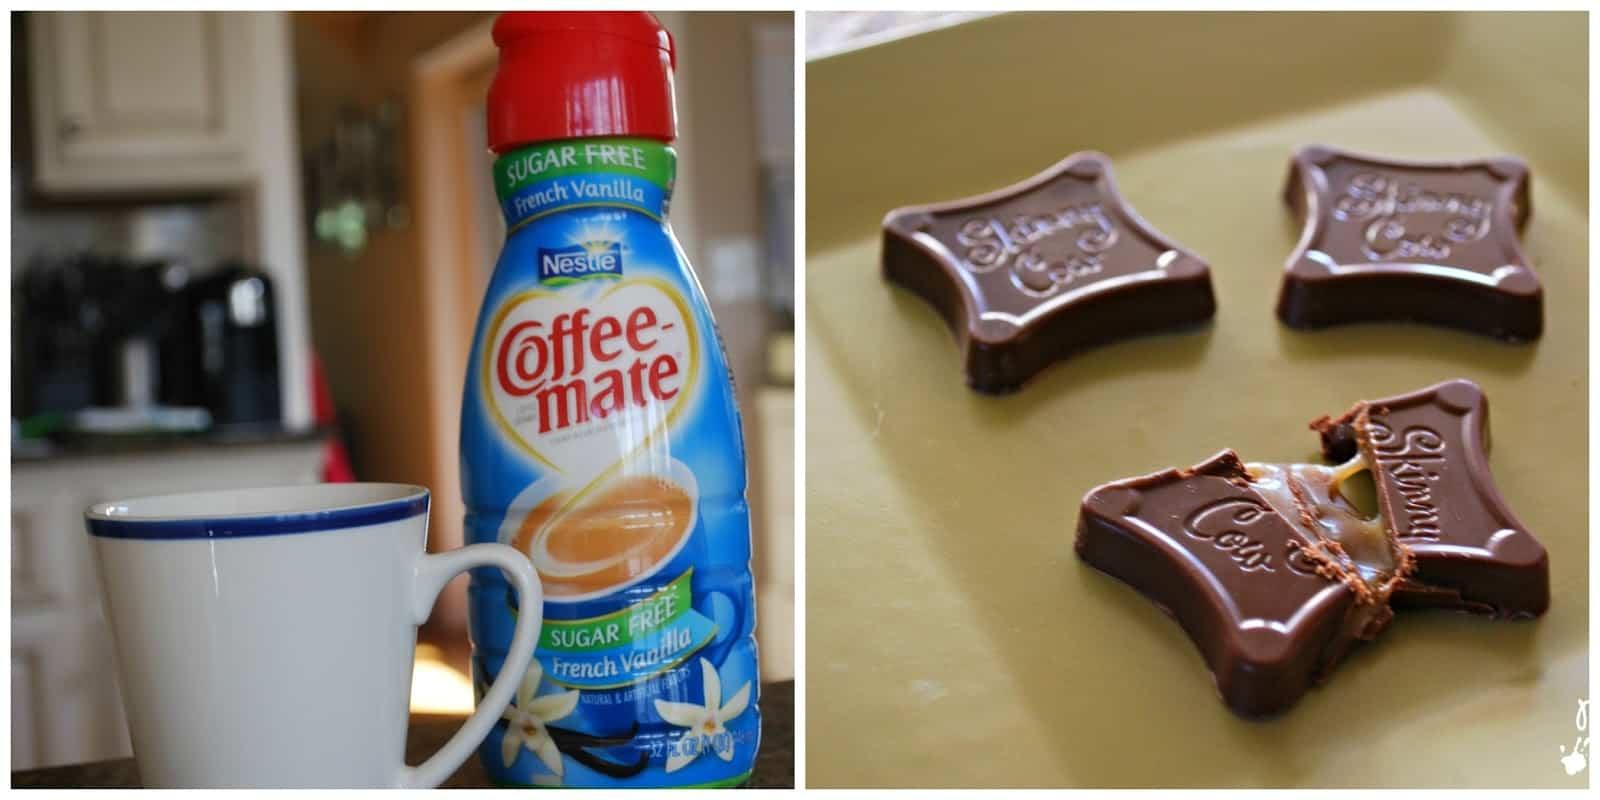 Coffee-mate #WowThatsGood #shop #cbias